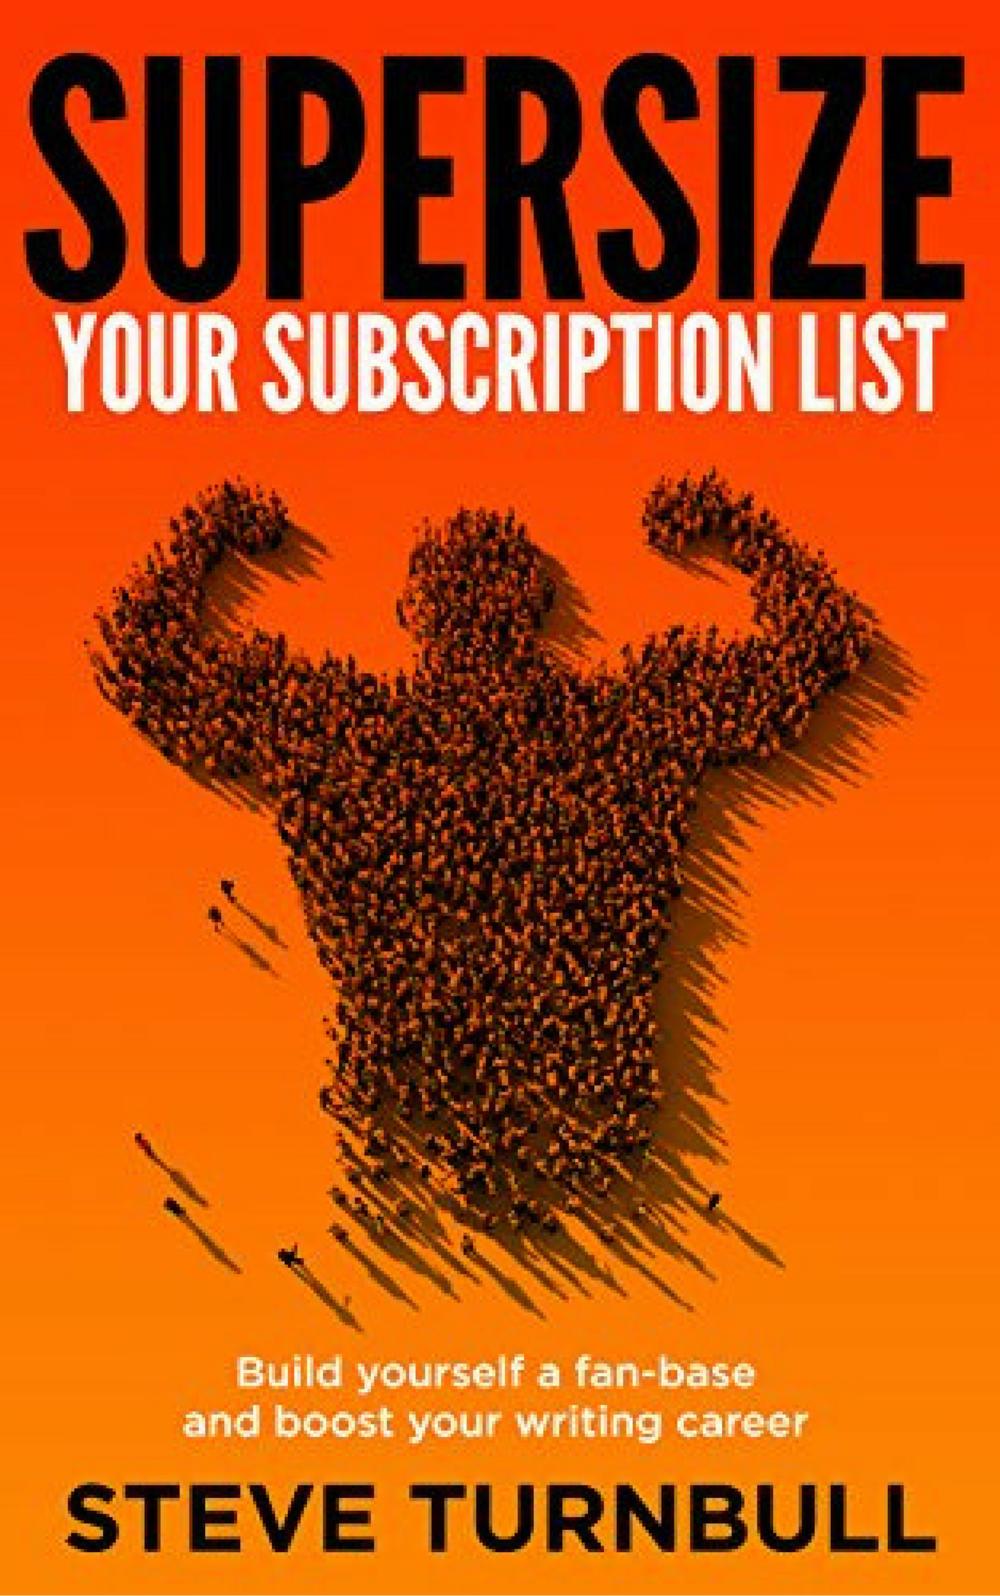 Supersize-Your-Subscription-List.jpg